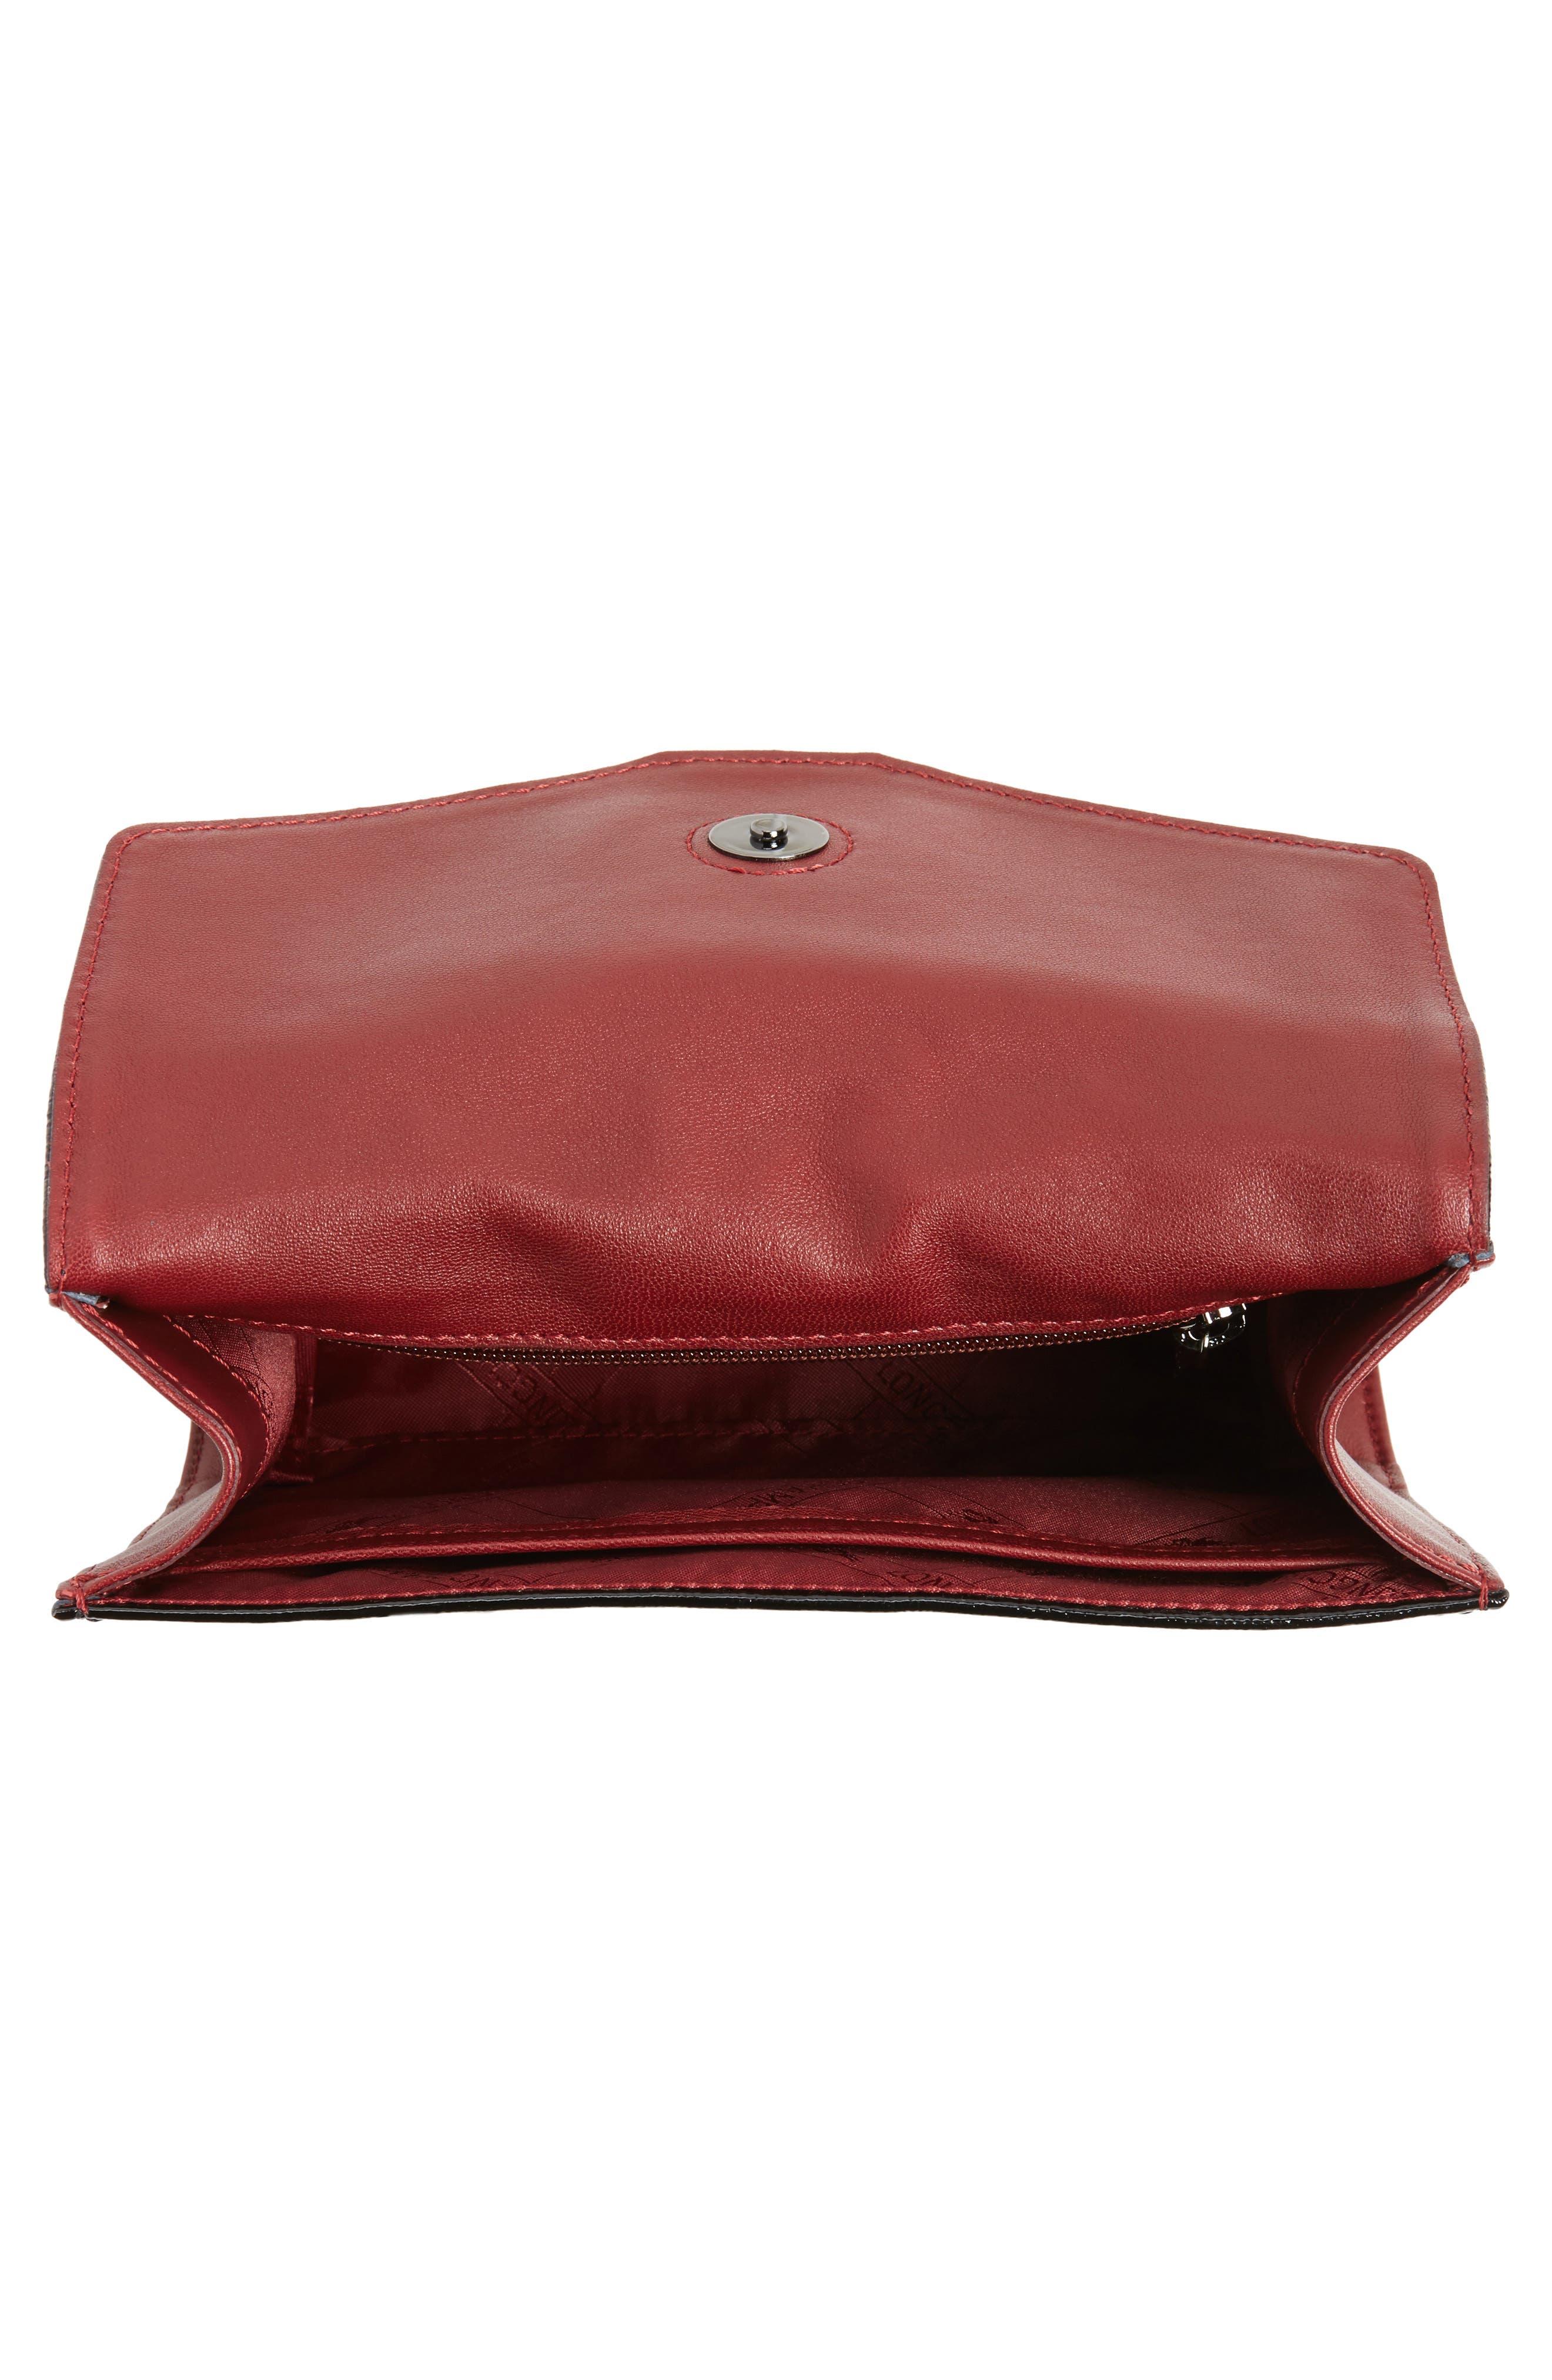 La Baronne Genuine Shearling Trim Leather Clutch,                             Alternate thumbnail 4, color,